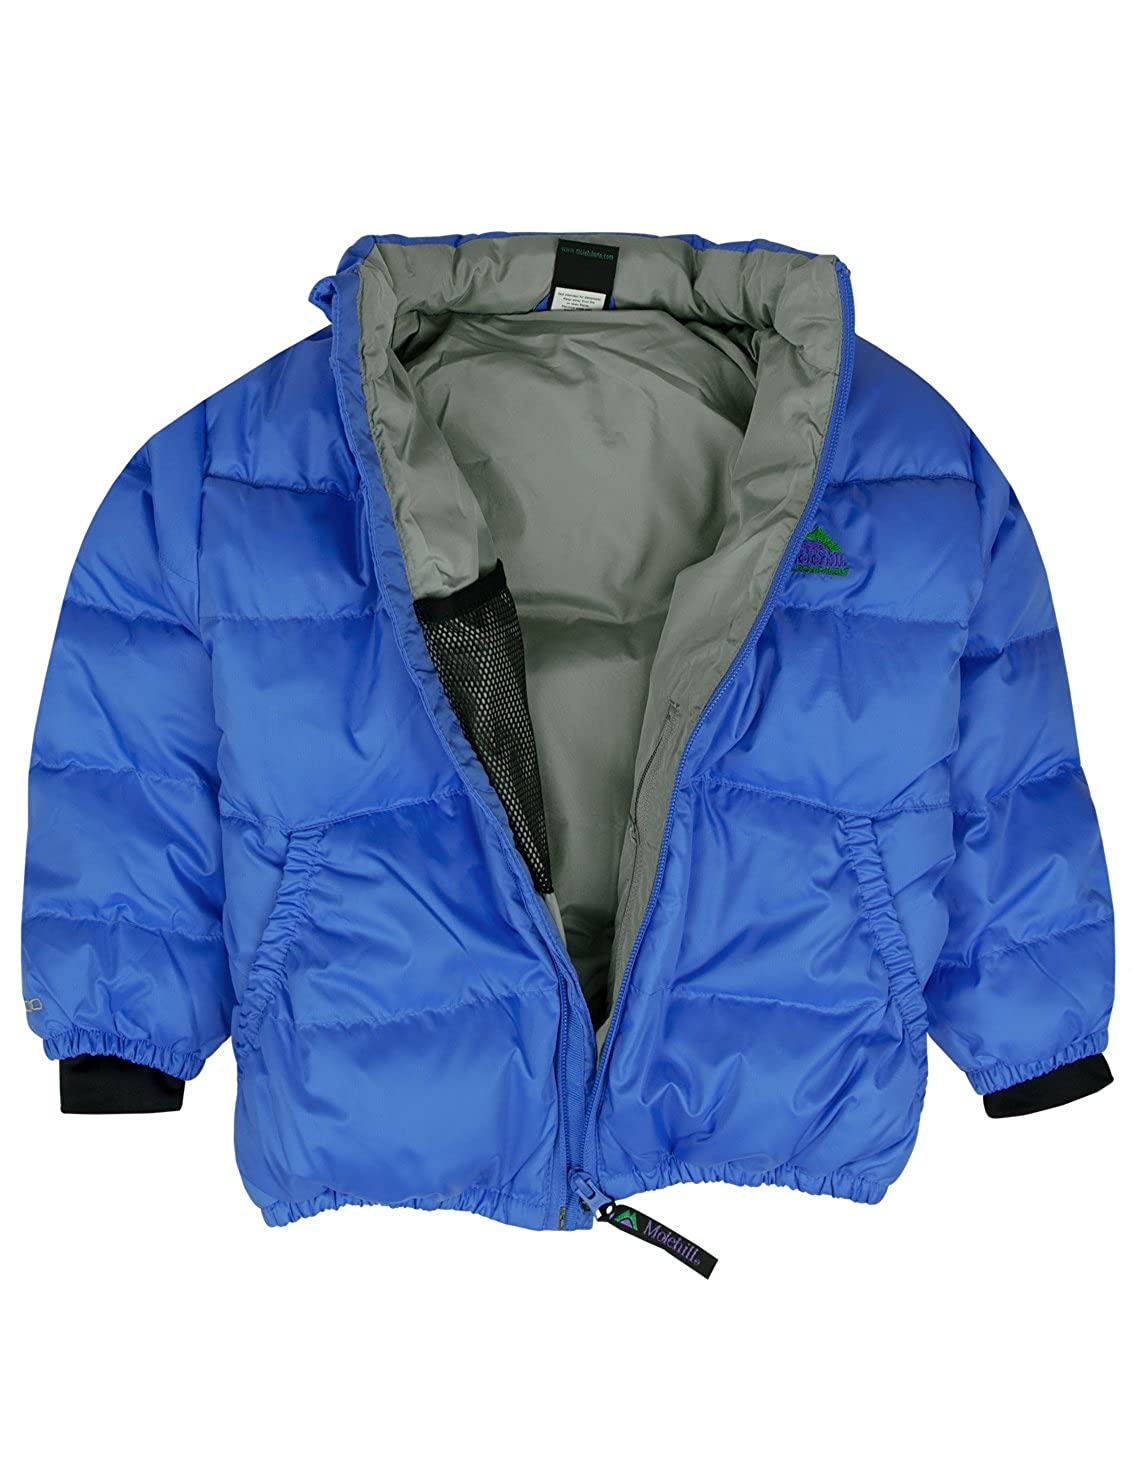 402a8aaf11d7 Amazon.com  Molehill Kids Down Hooded Jacket